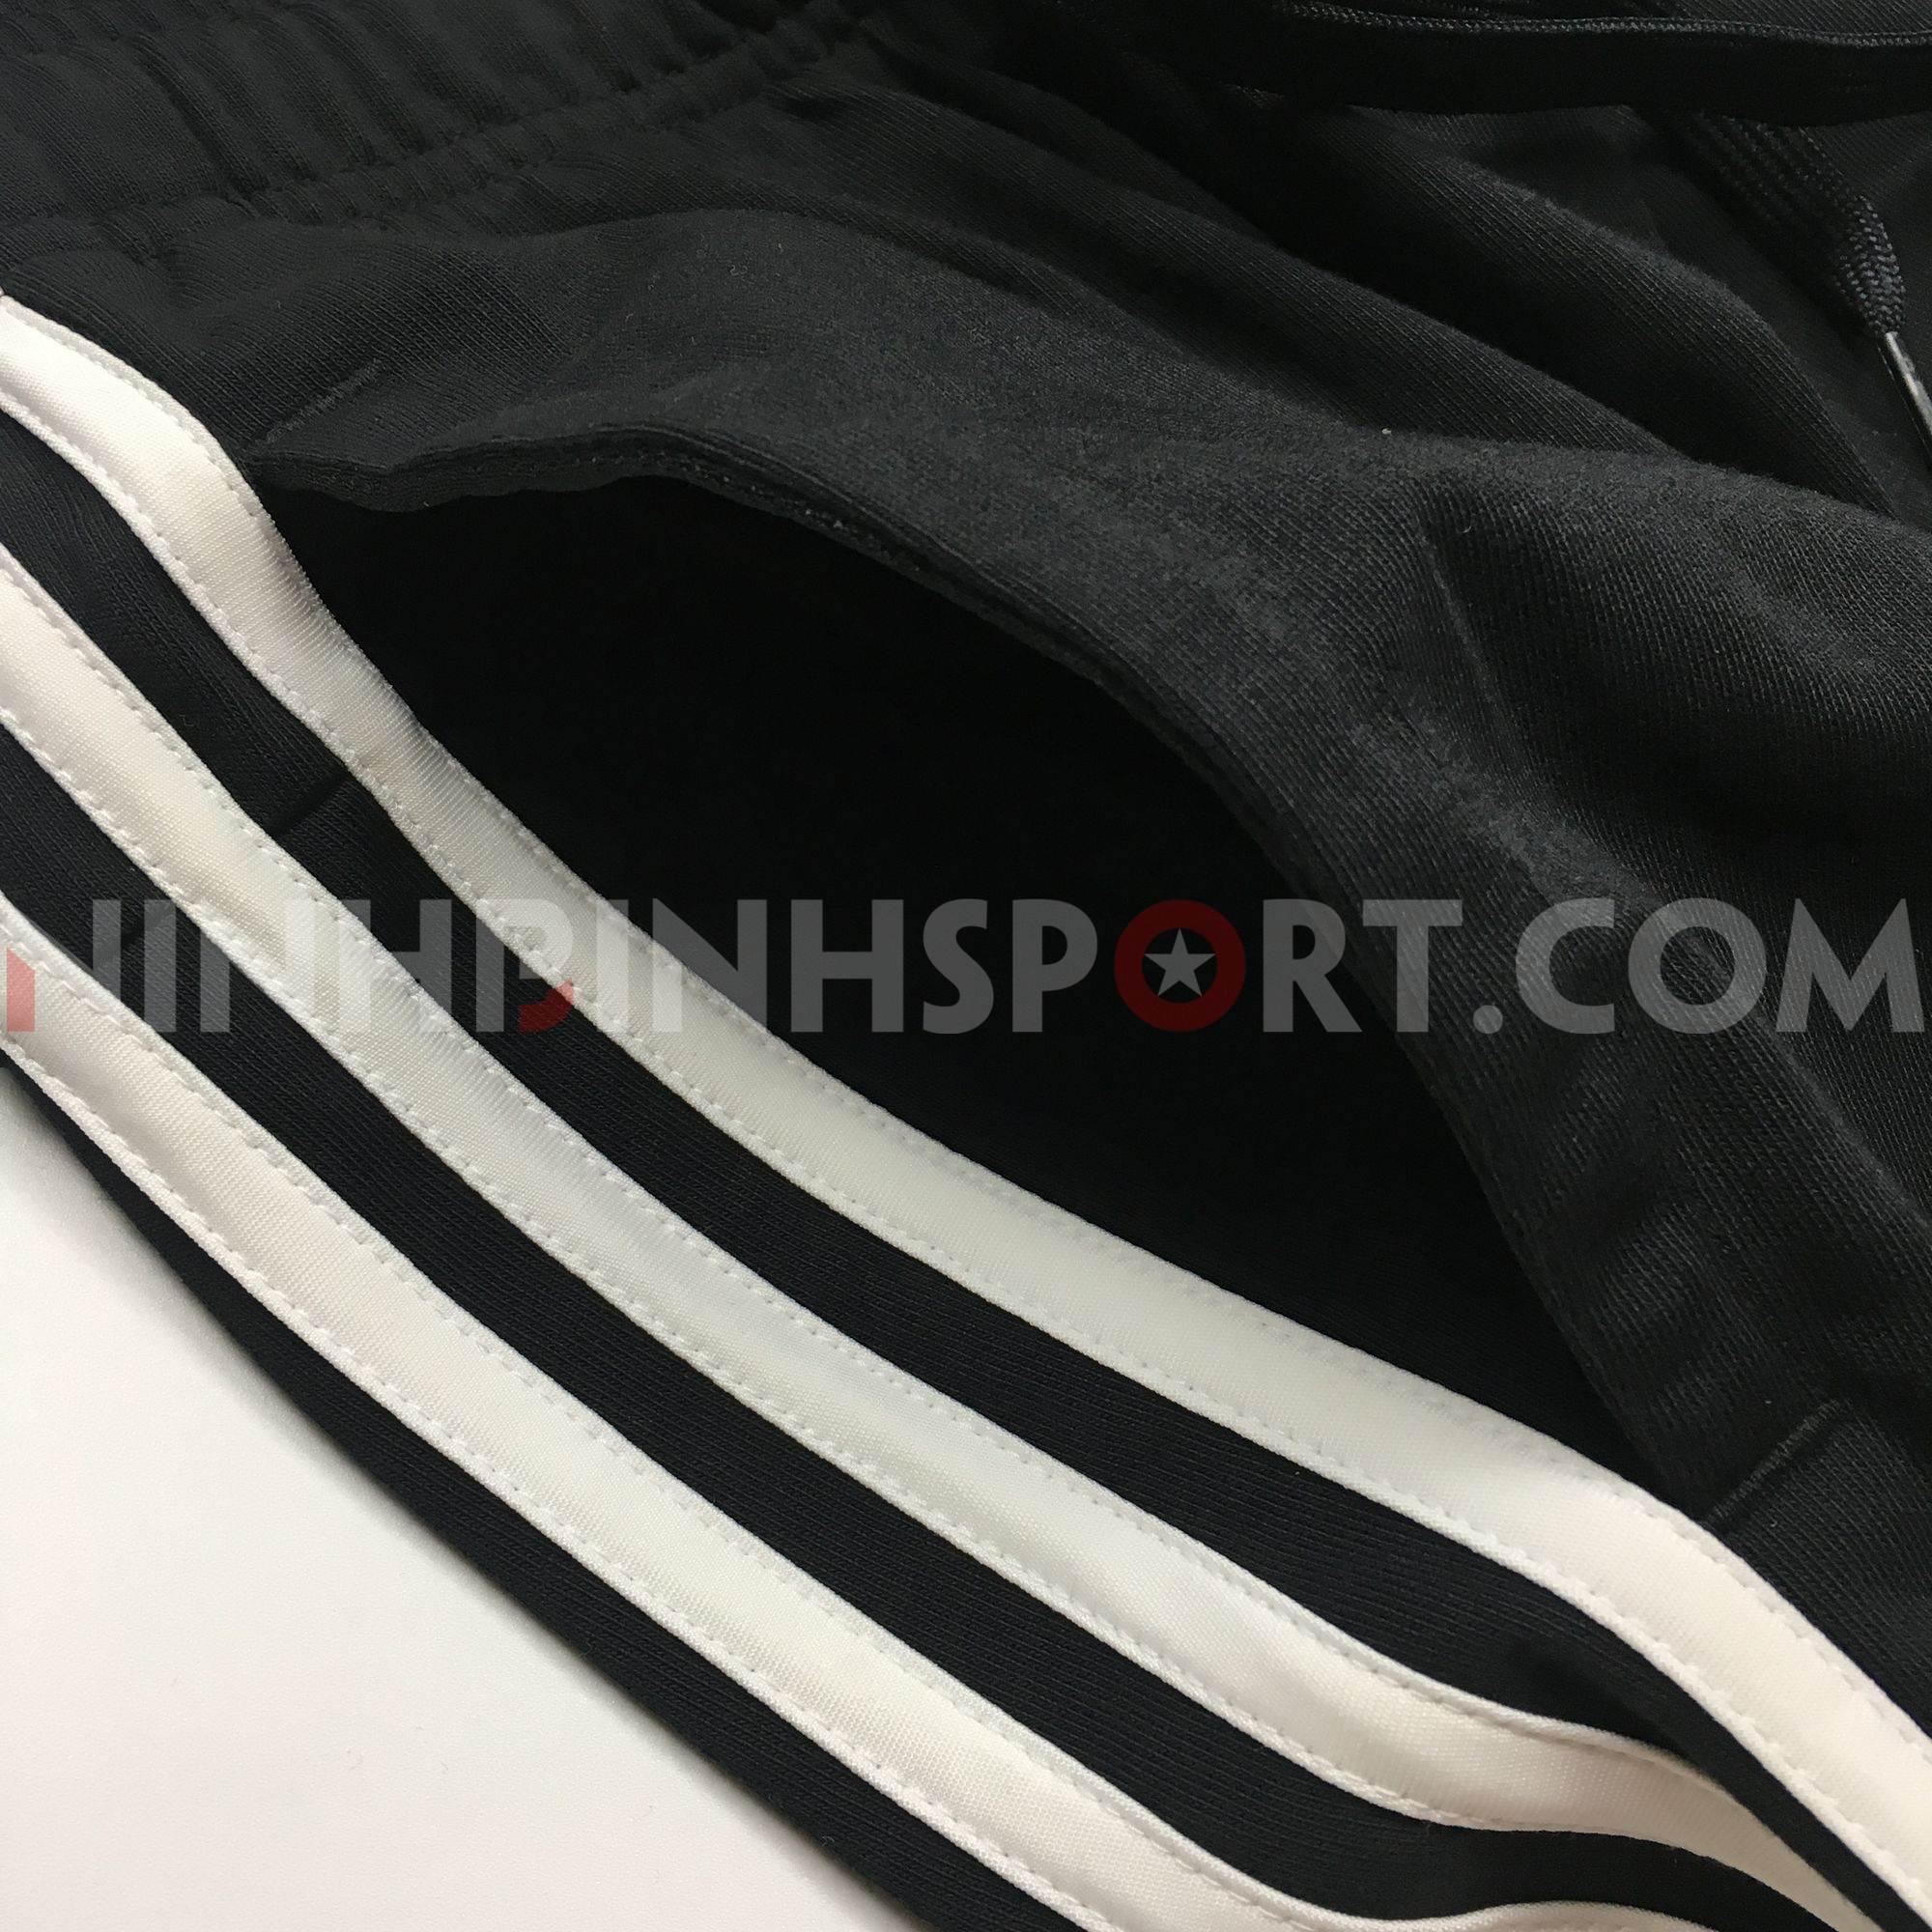 Quần dài thể thao nam Adidas Essentials 3-Stripes DU0456